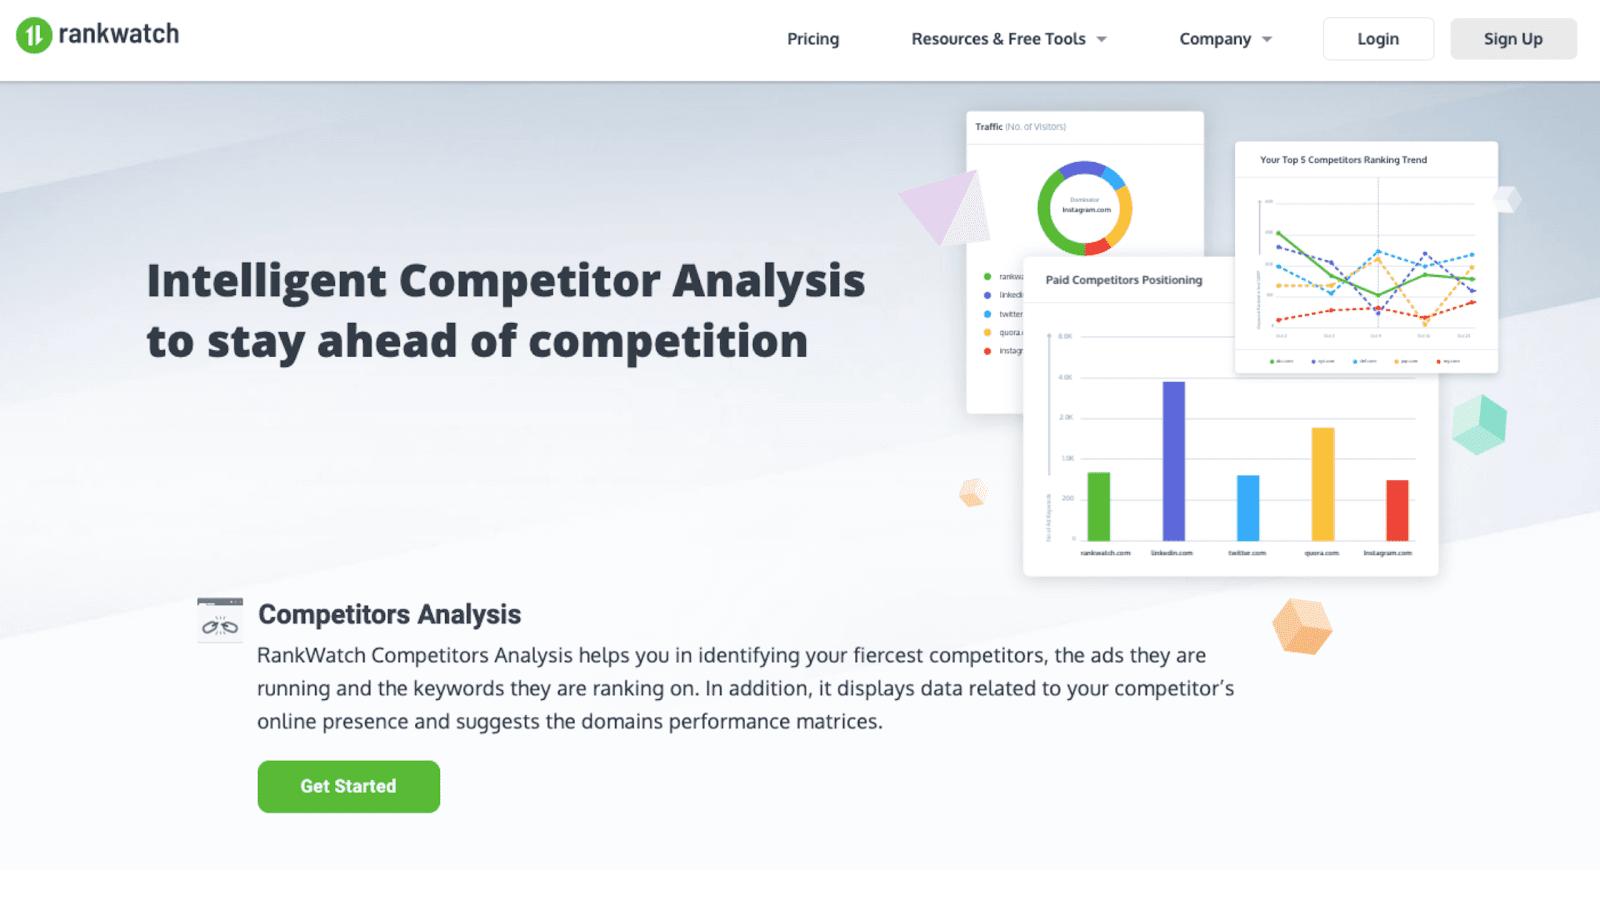 Intelligent Competitor Analysis page on Rankwatch